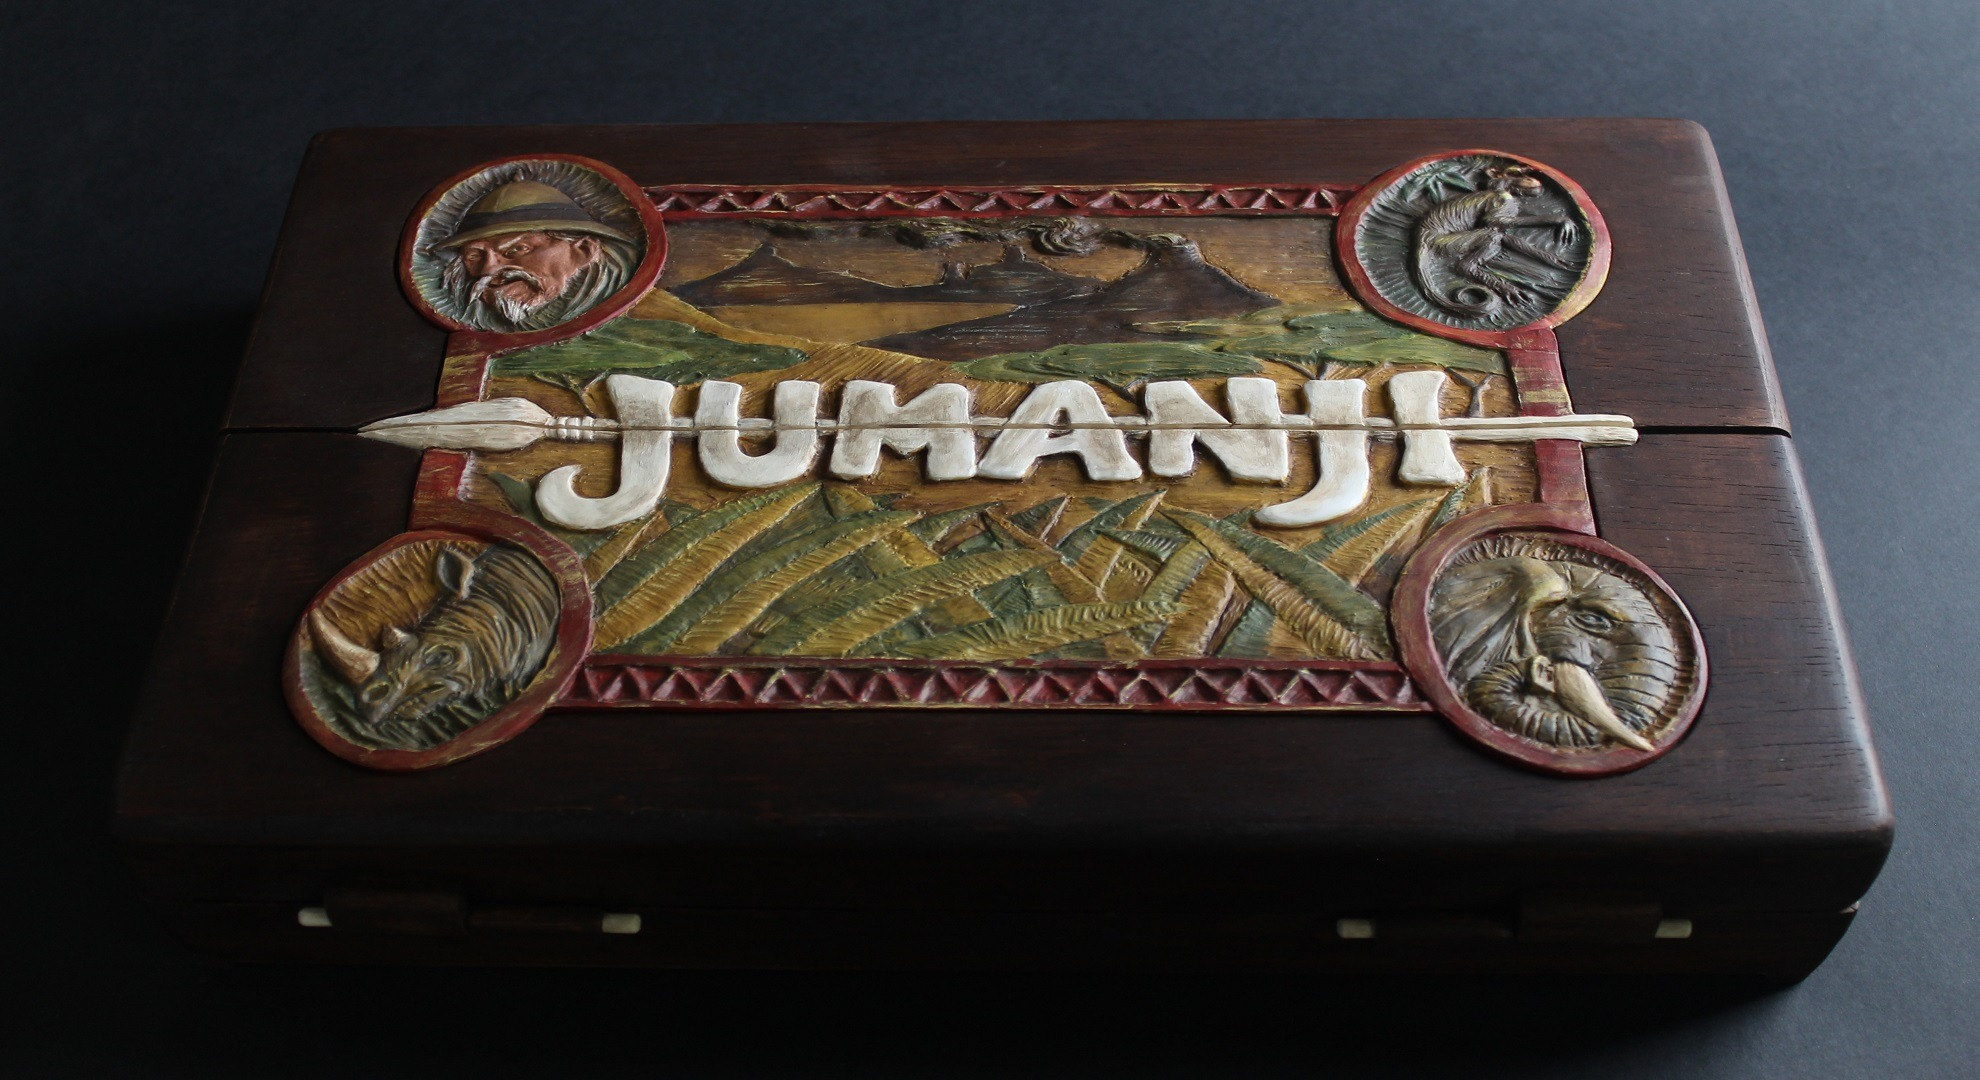 This Handmade Jumanji Board Build Process Will Suck You In